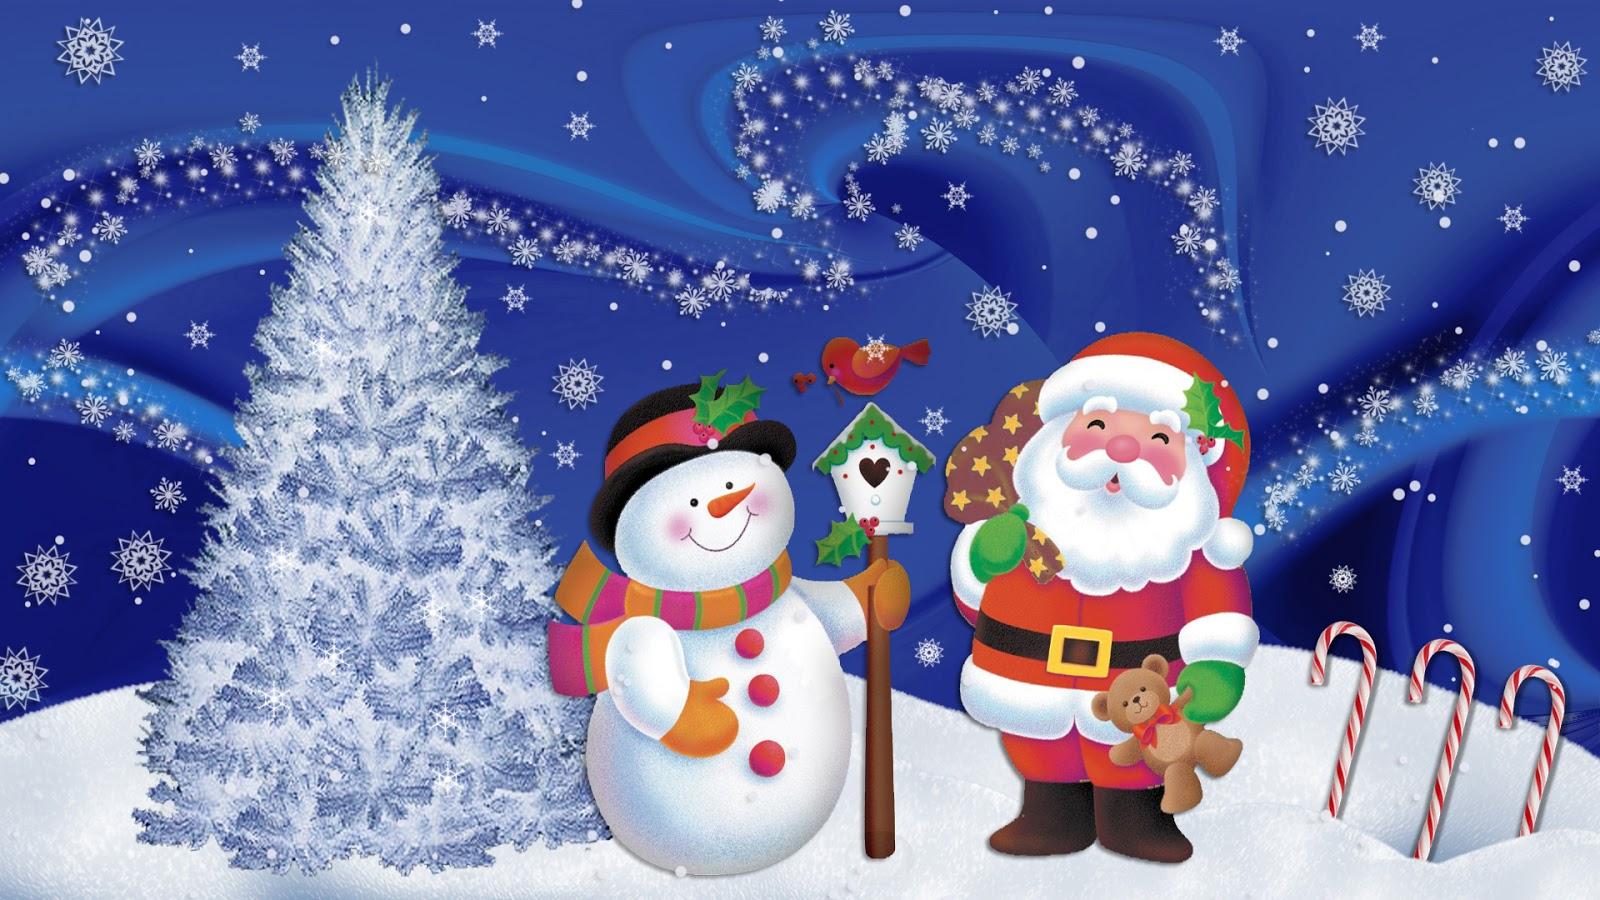 Christmas Wallpapers HD | Best Best Christmas Desktop Wallpapers HD ...